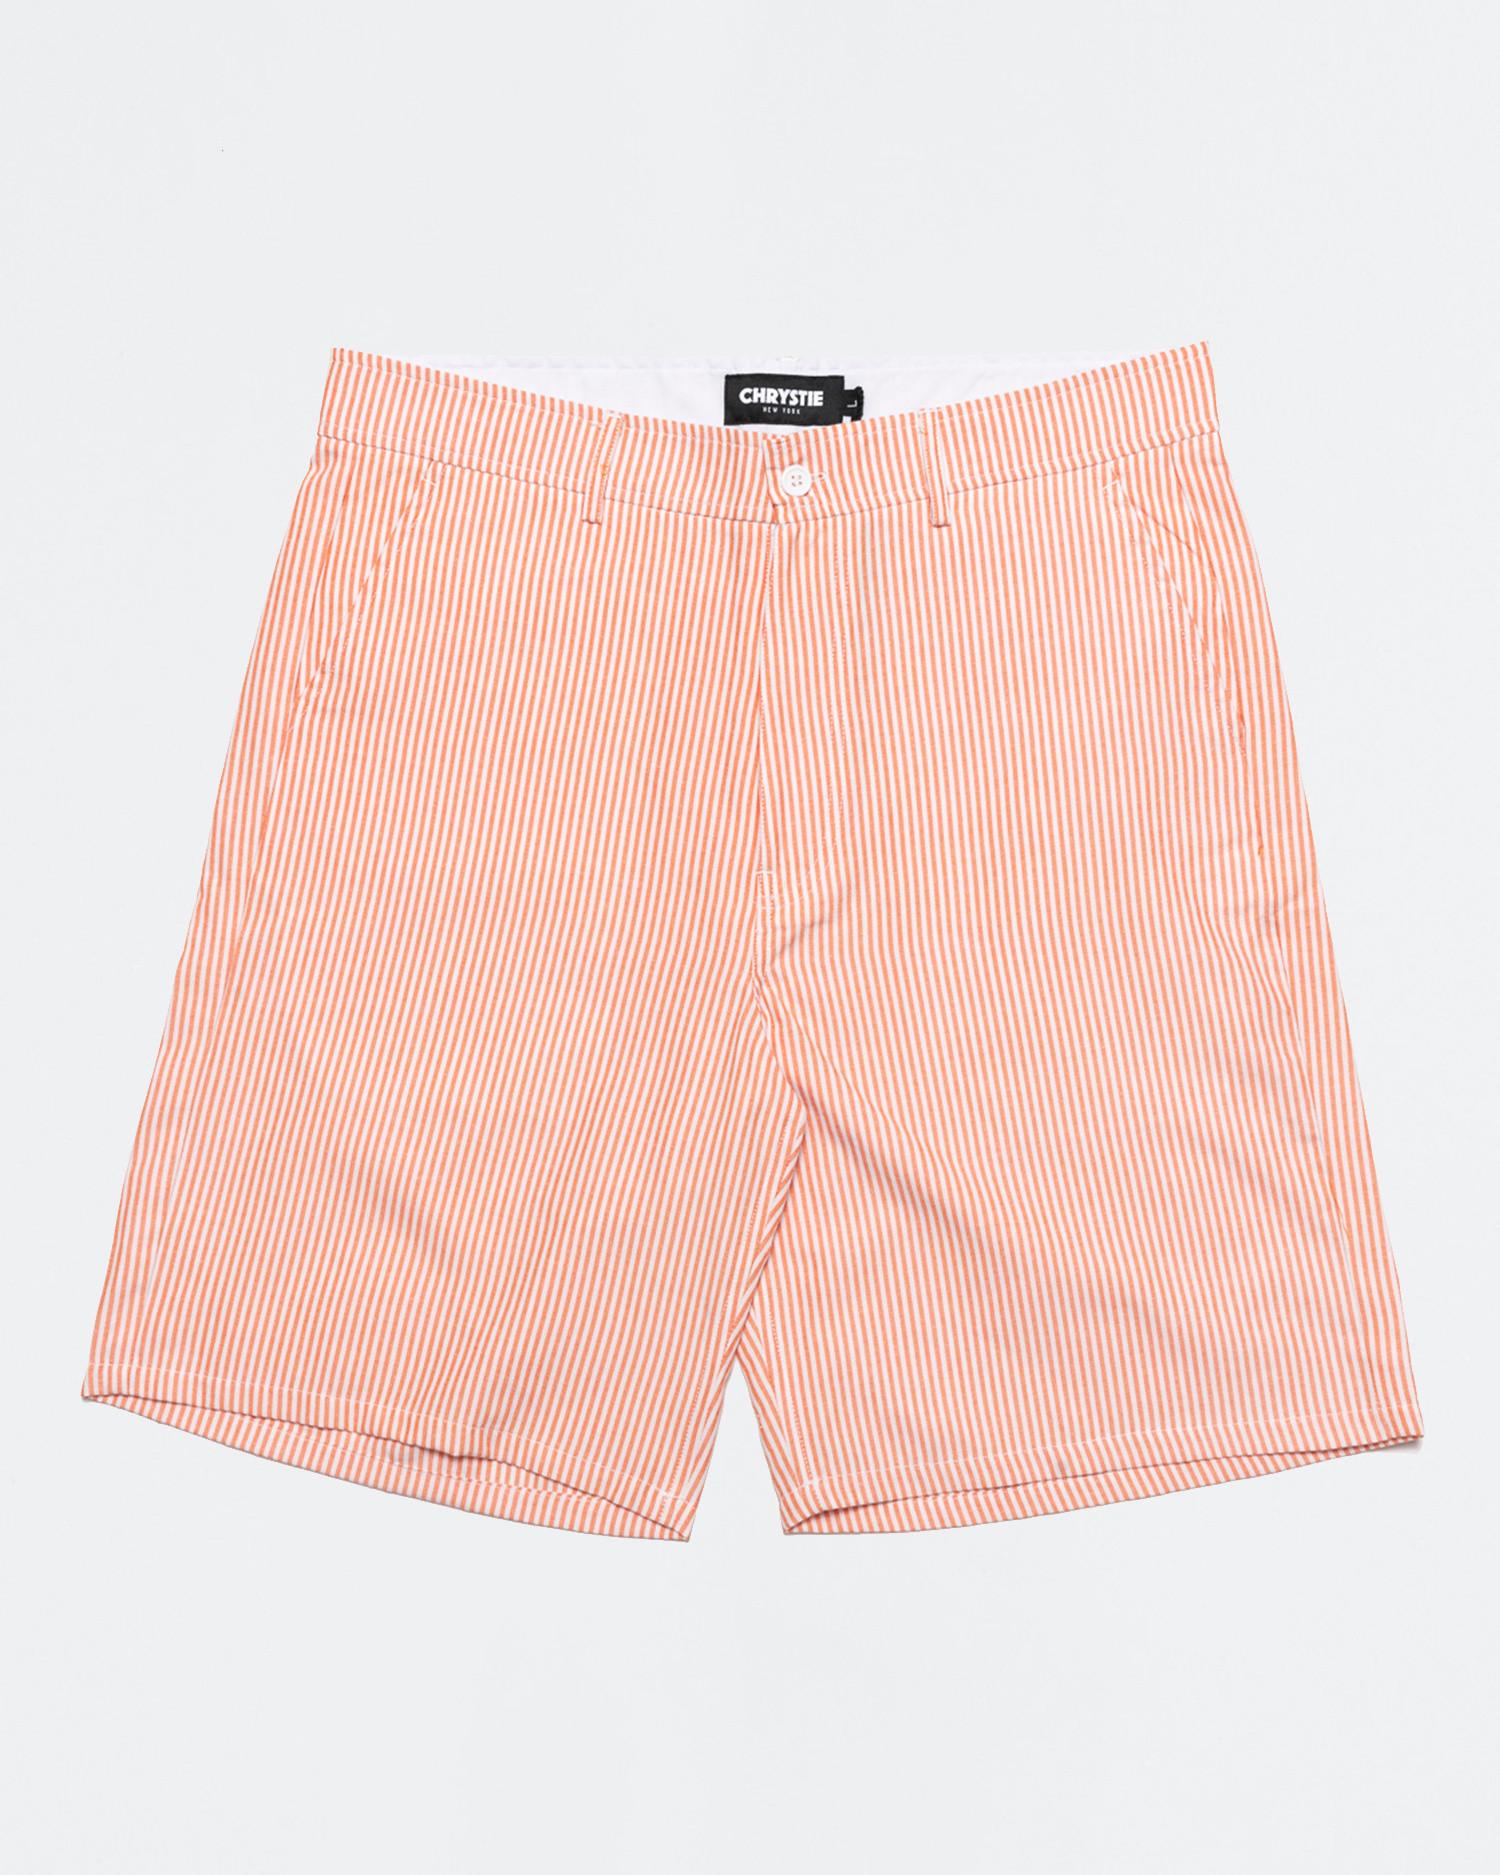 Chrystie NYC OG Logo Seersucker Short Pant Orange Stripes